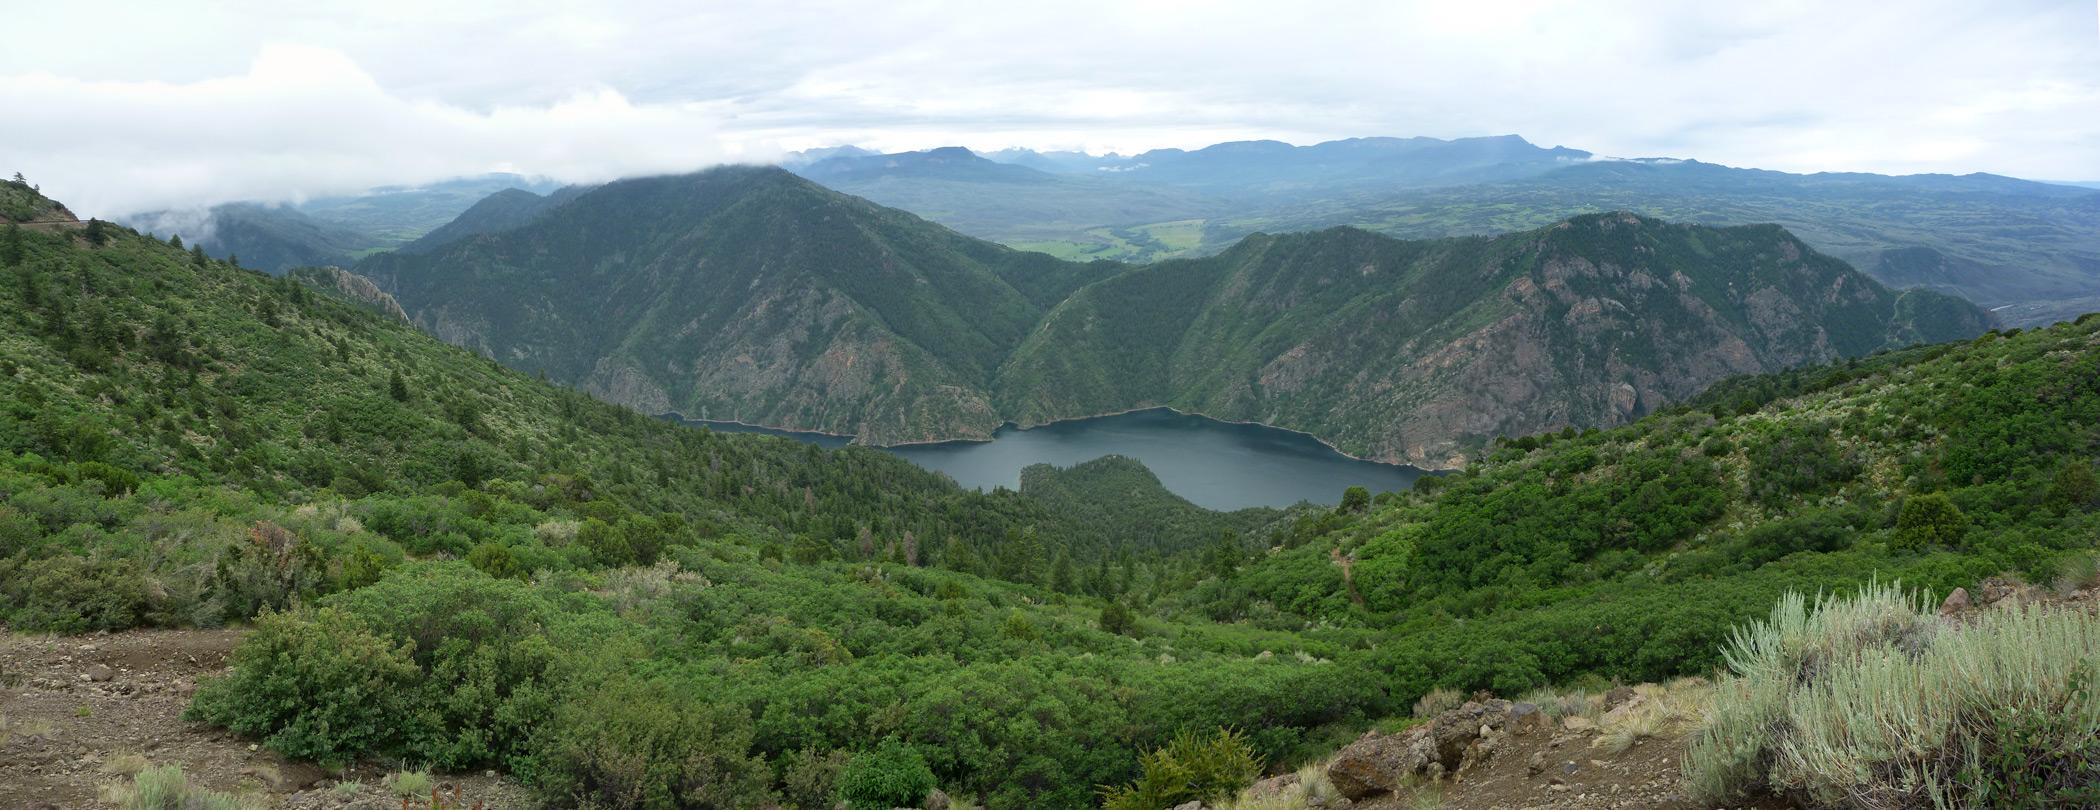 Hermits Rest: Curecanti National Recreation Area, Colorado